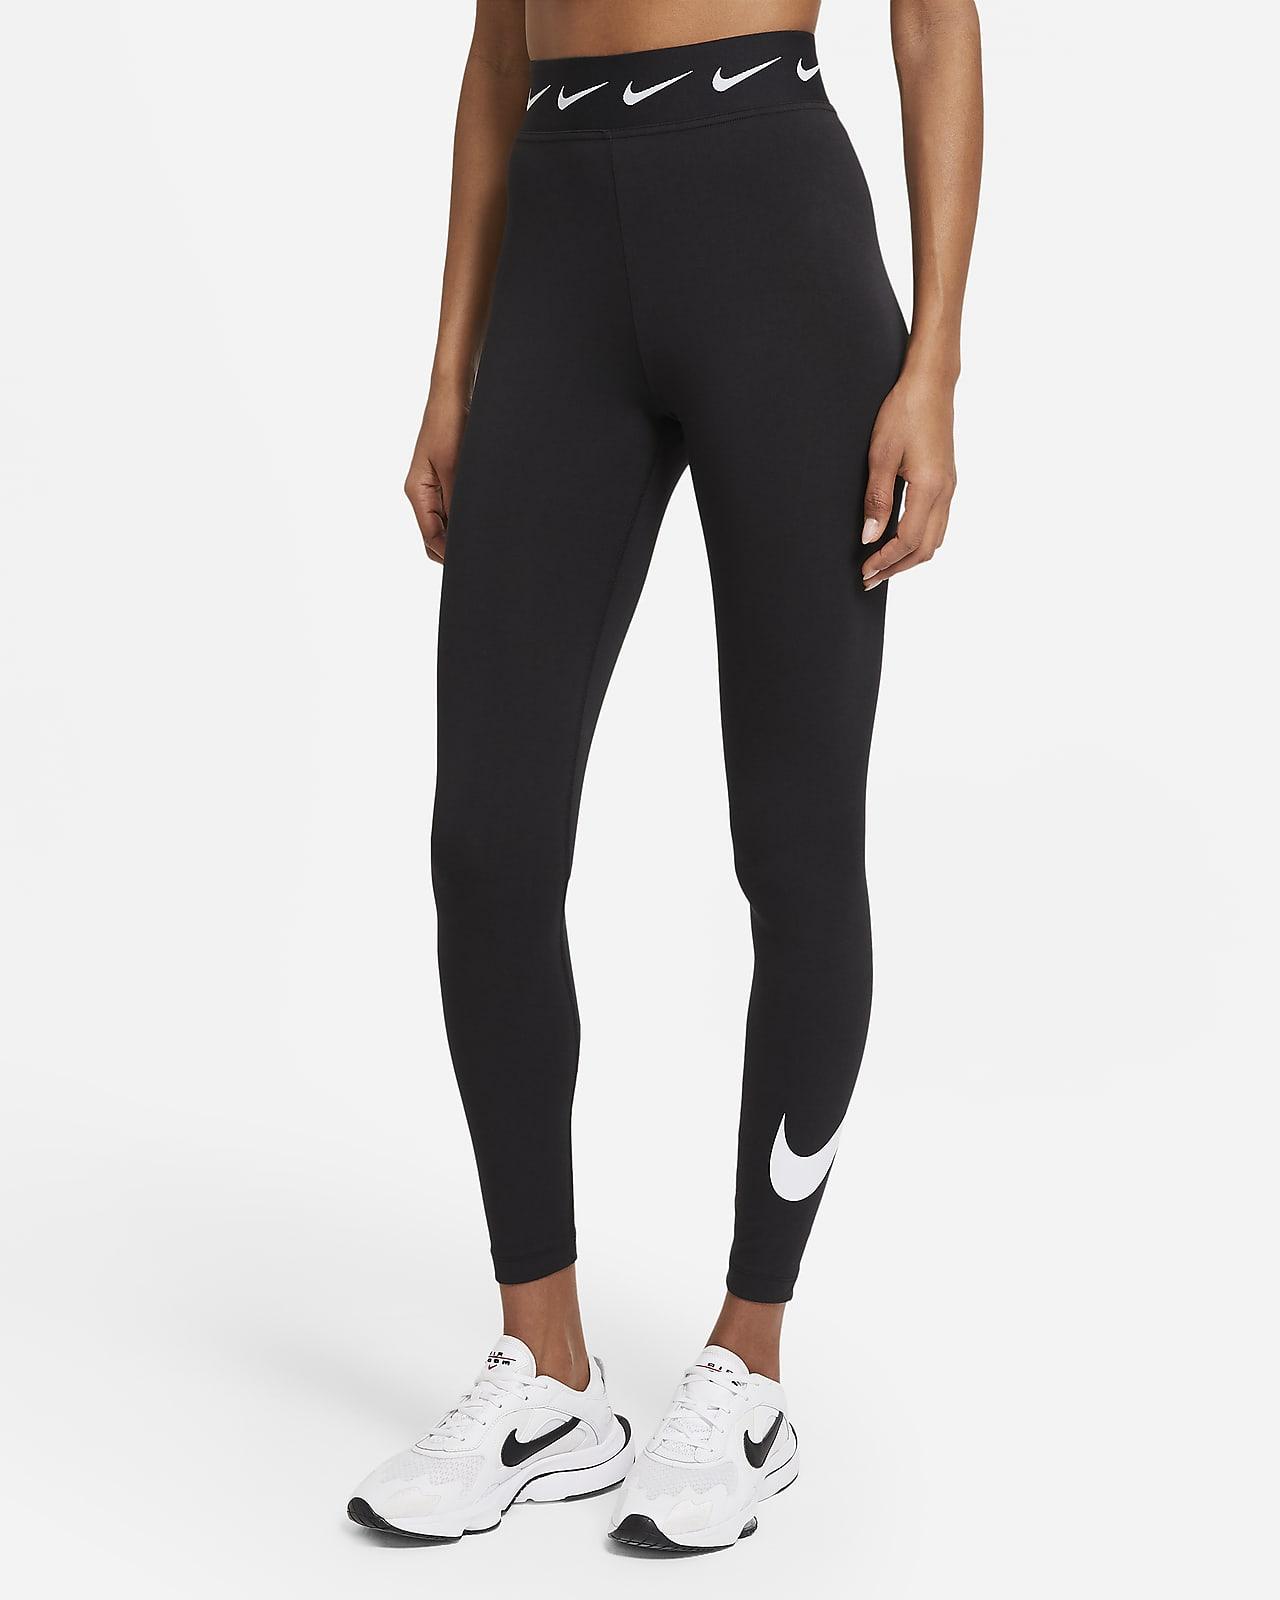 Legging taille haute Nike Sportswear Club pour Femme